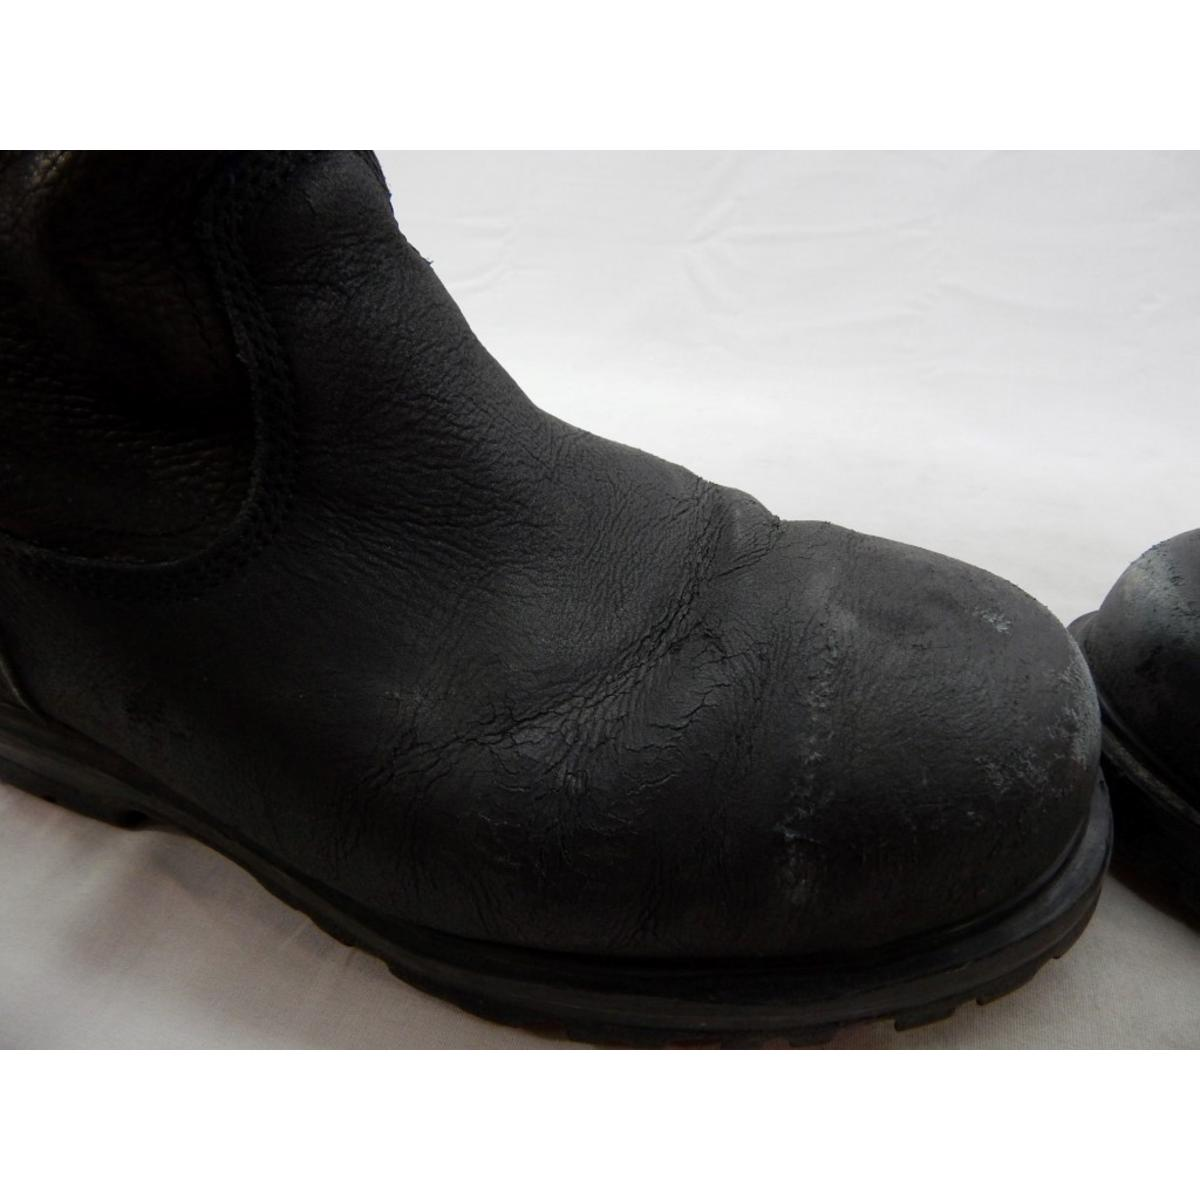 b977c130b3ed Timberland Pro Powerwelt Men s Brown Boot 12M 6 6 of 6 See More